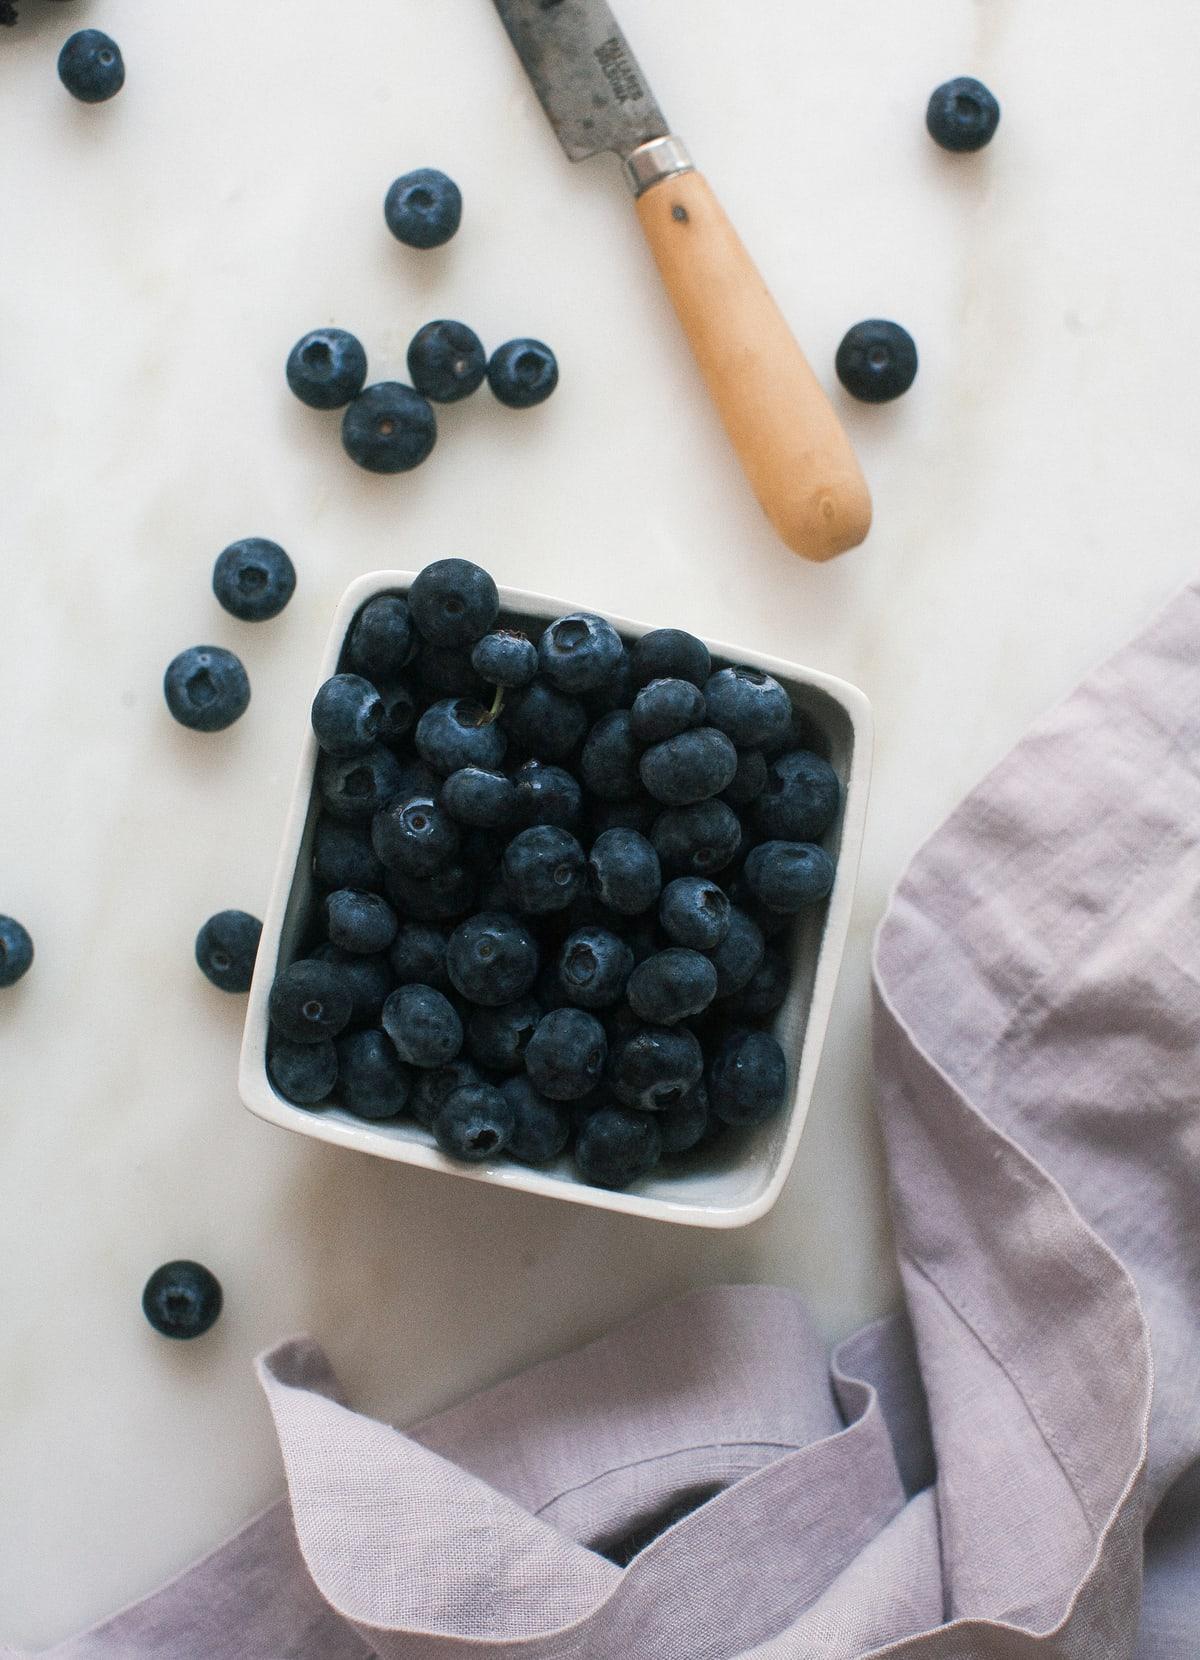 Blueberry-Blackberry Turnovers